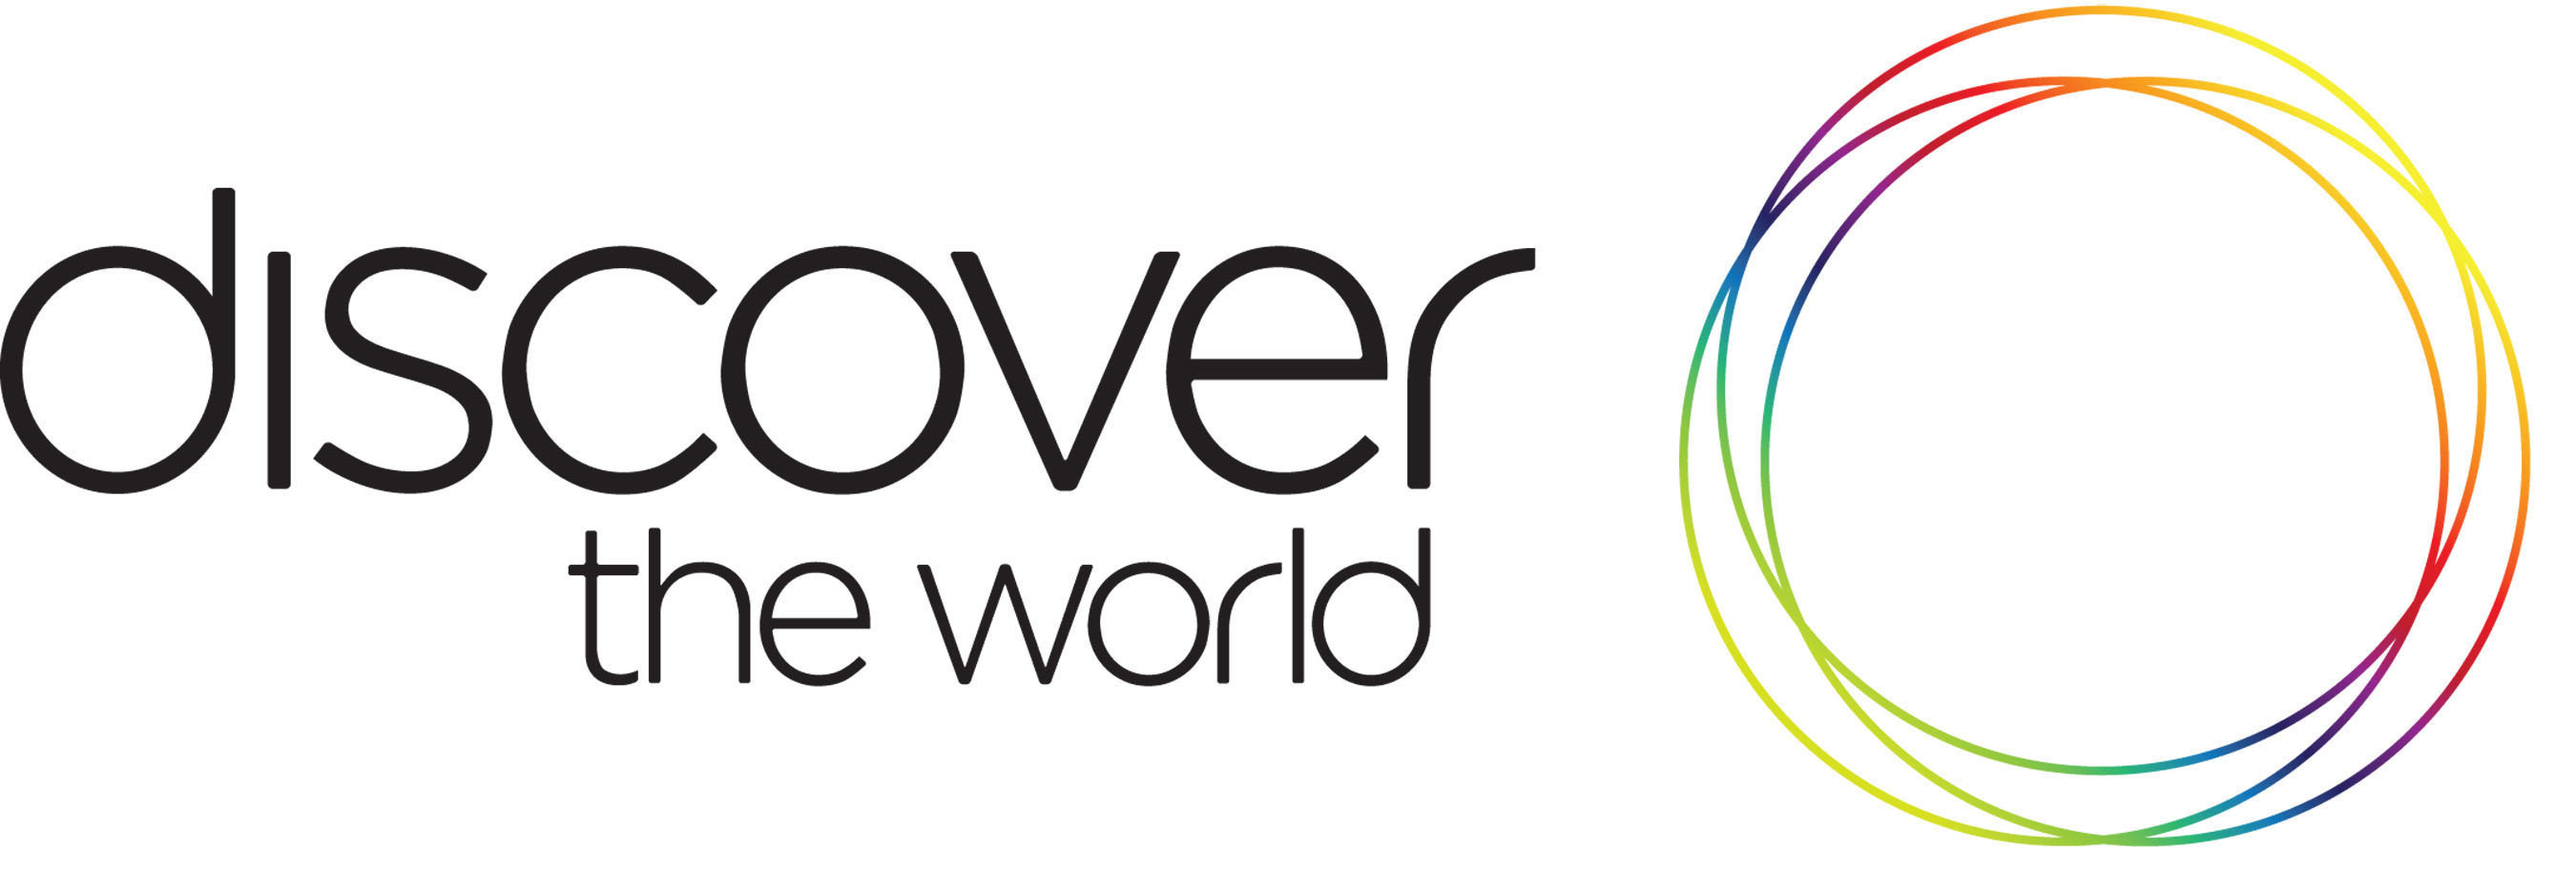 Discover the World's logo. (PRNewsFoto/Discover the World Marketing) (PRNewsFoto/)